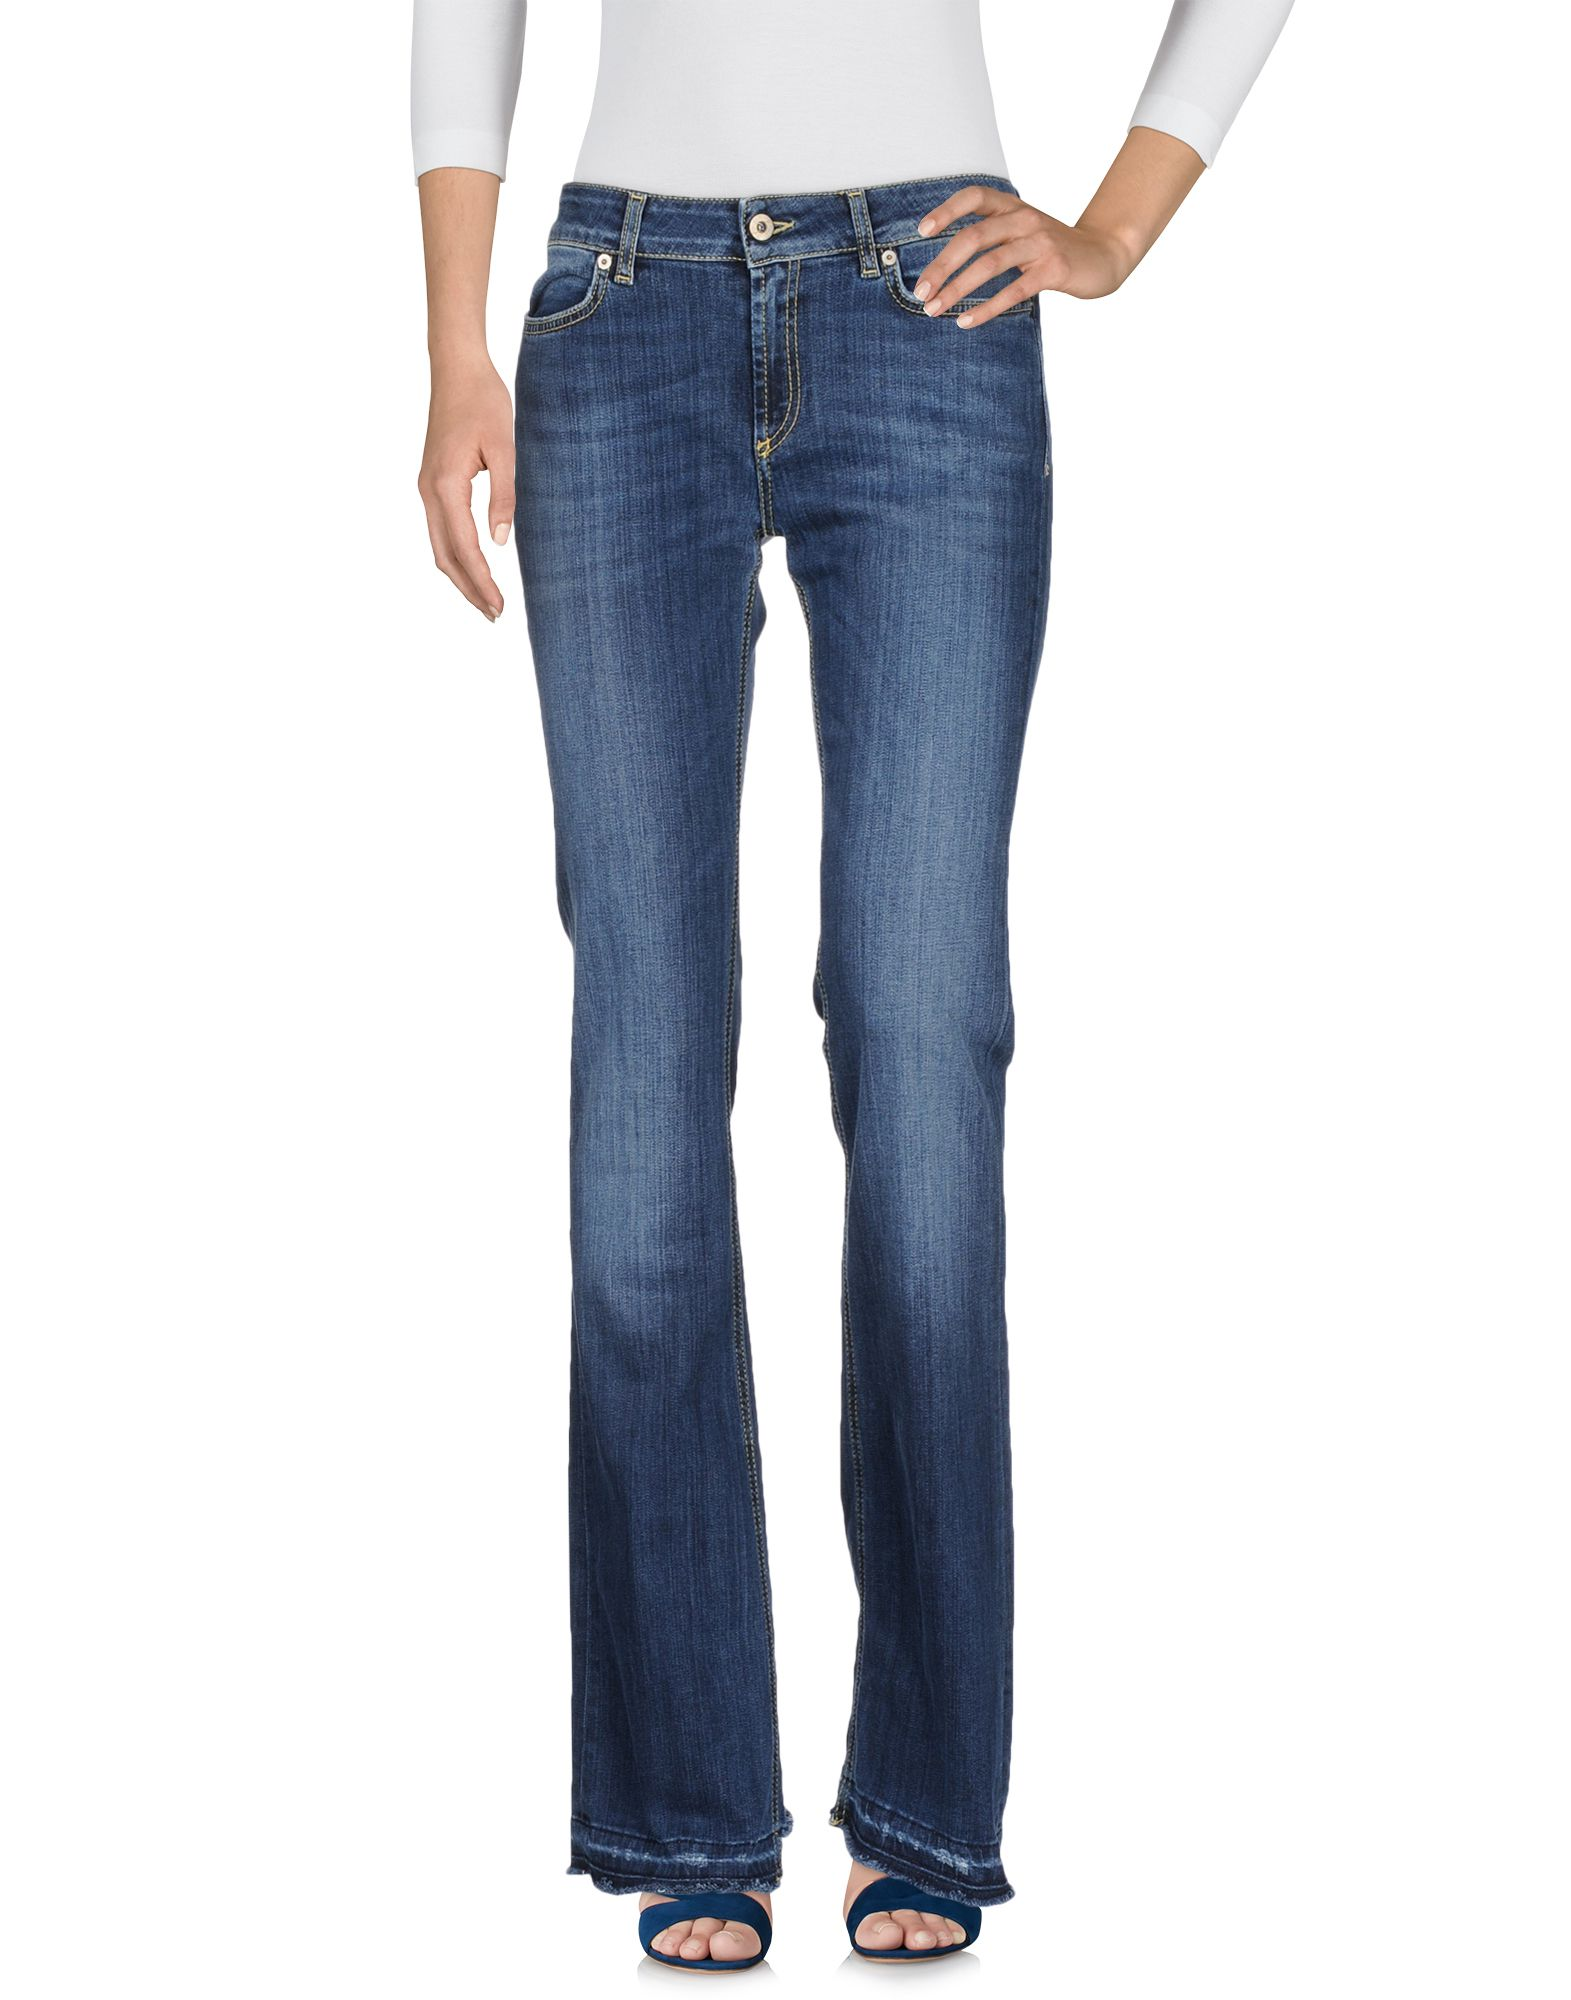 Pantaloni Jeans Dondup Donna - Acquista online su ivmk2